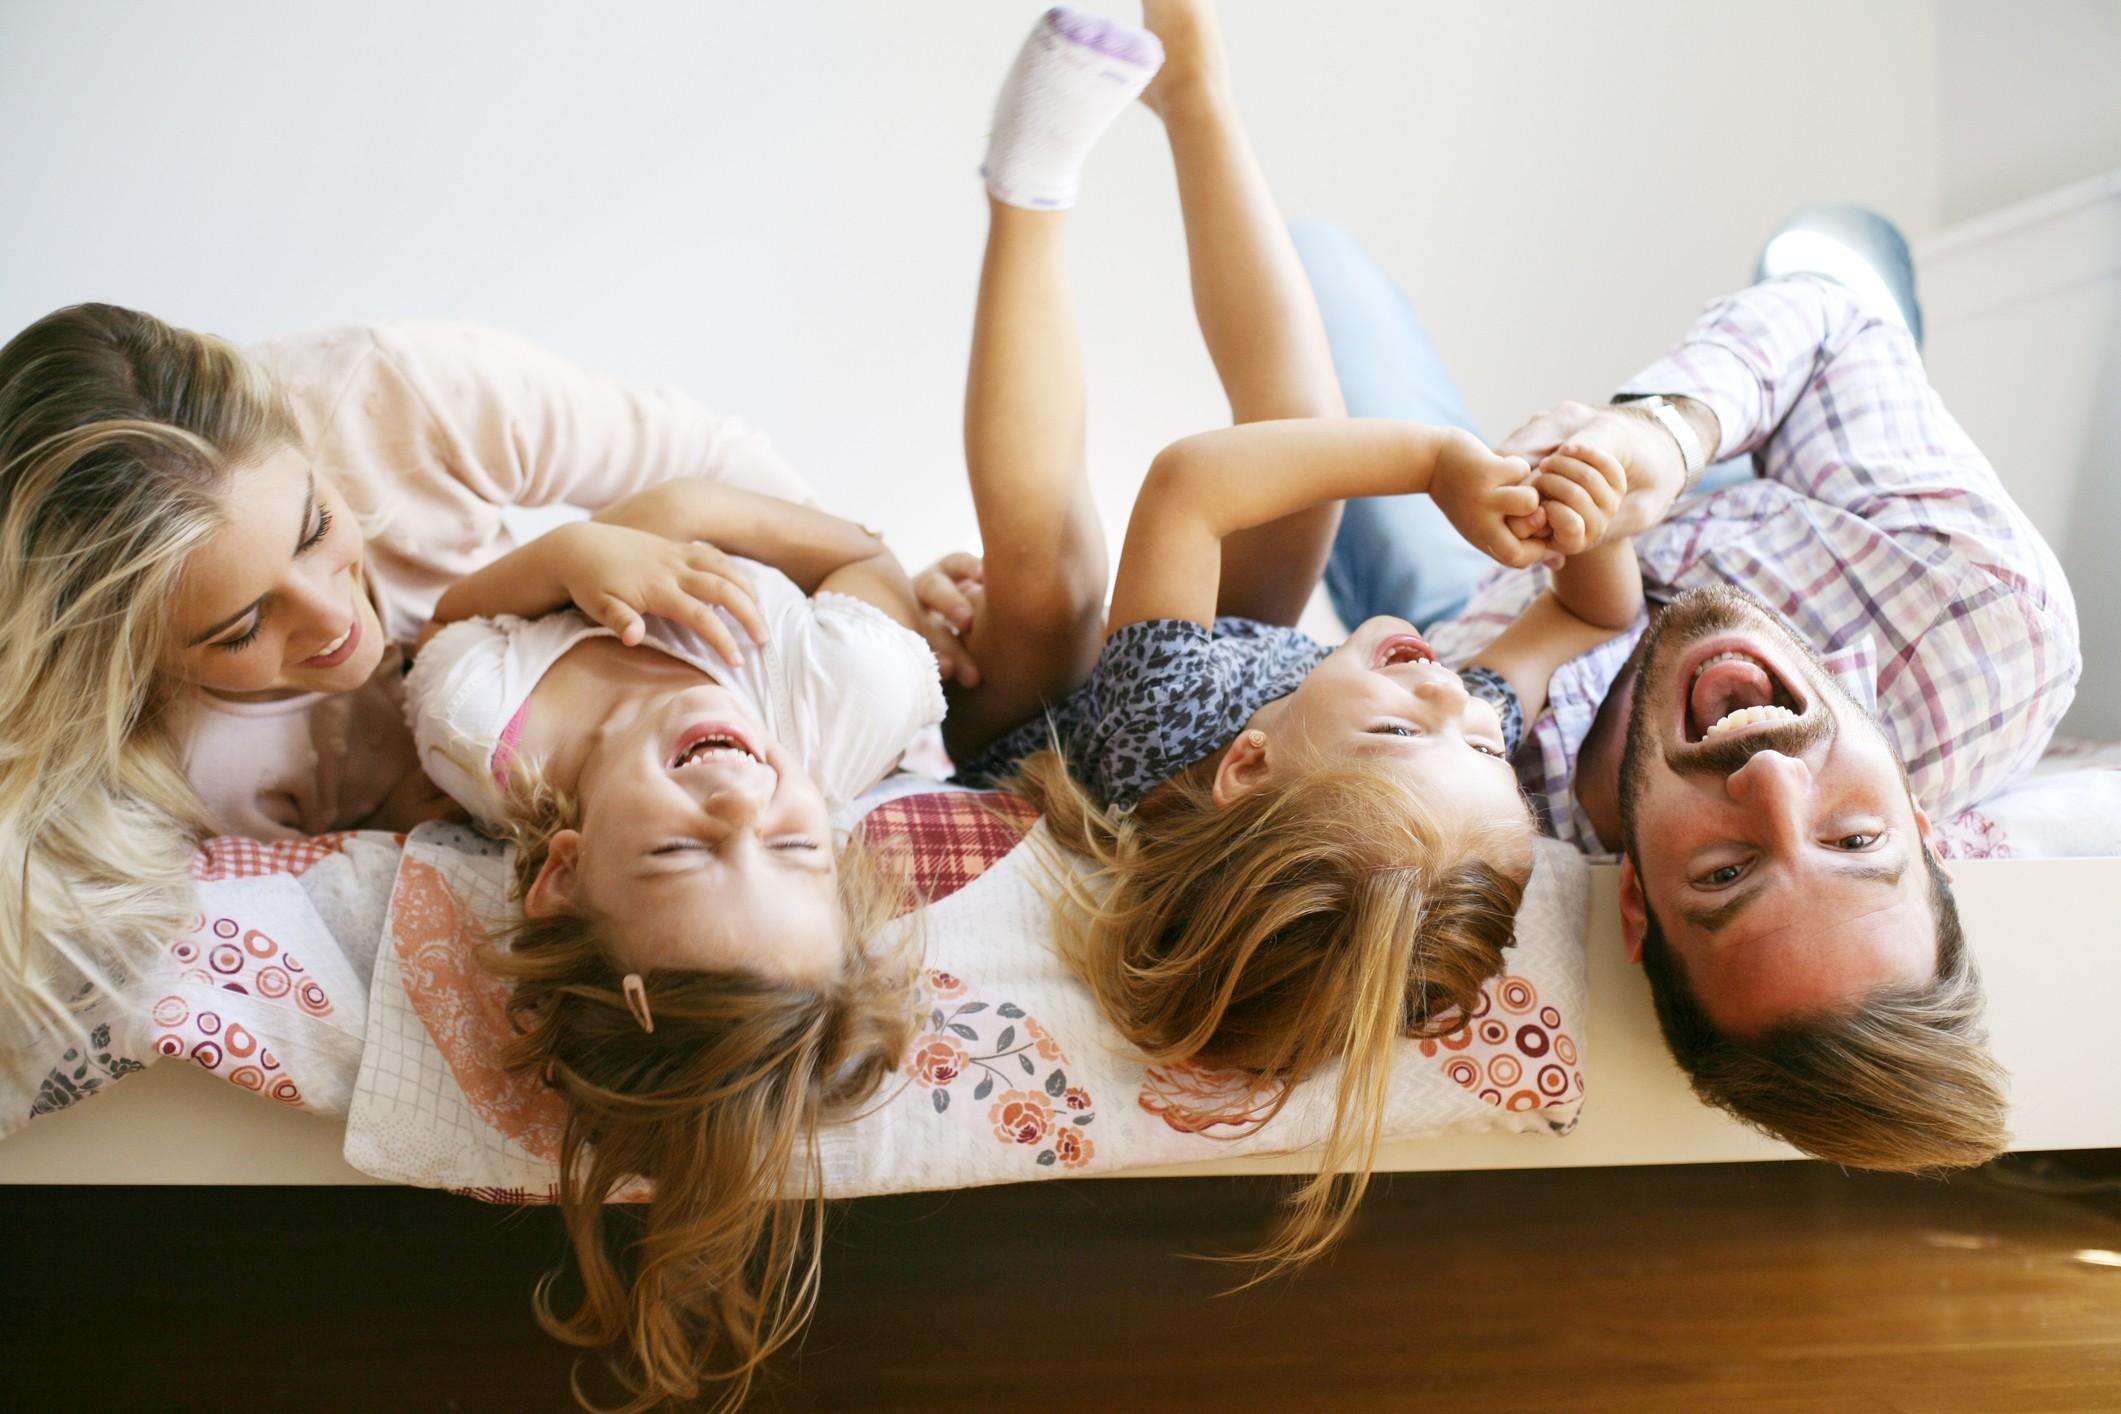 Família, feliz, amizade, filhos, pais (Foto: Thinkstock)